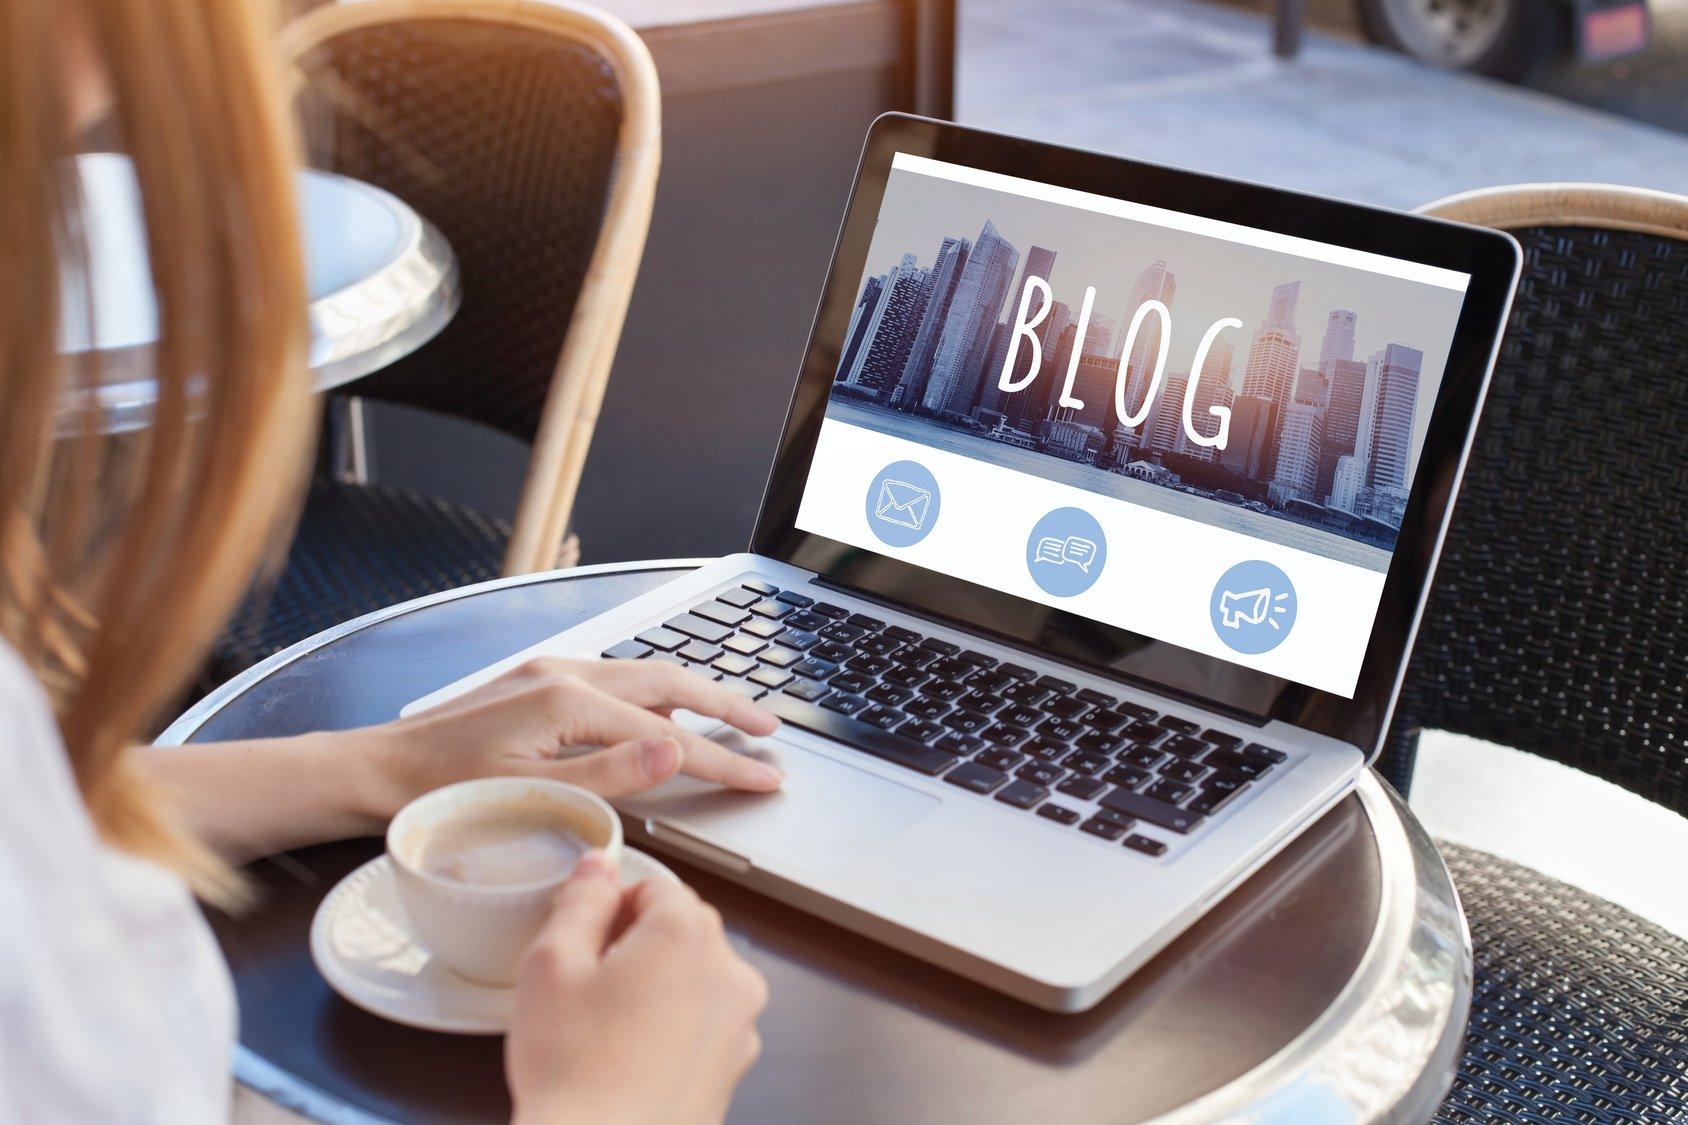 Capsivera Steuerberater für Blogger - Vlogger - Bild